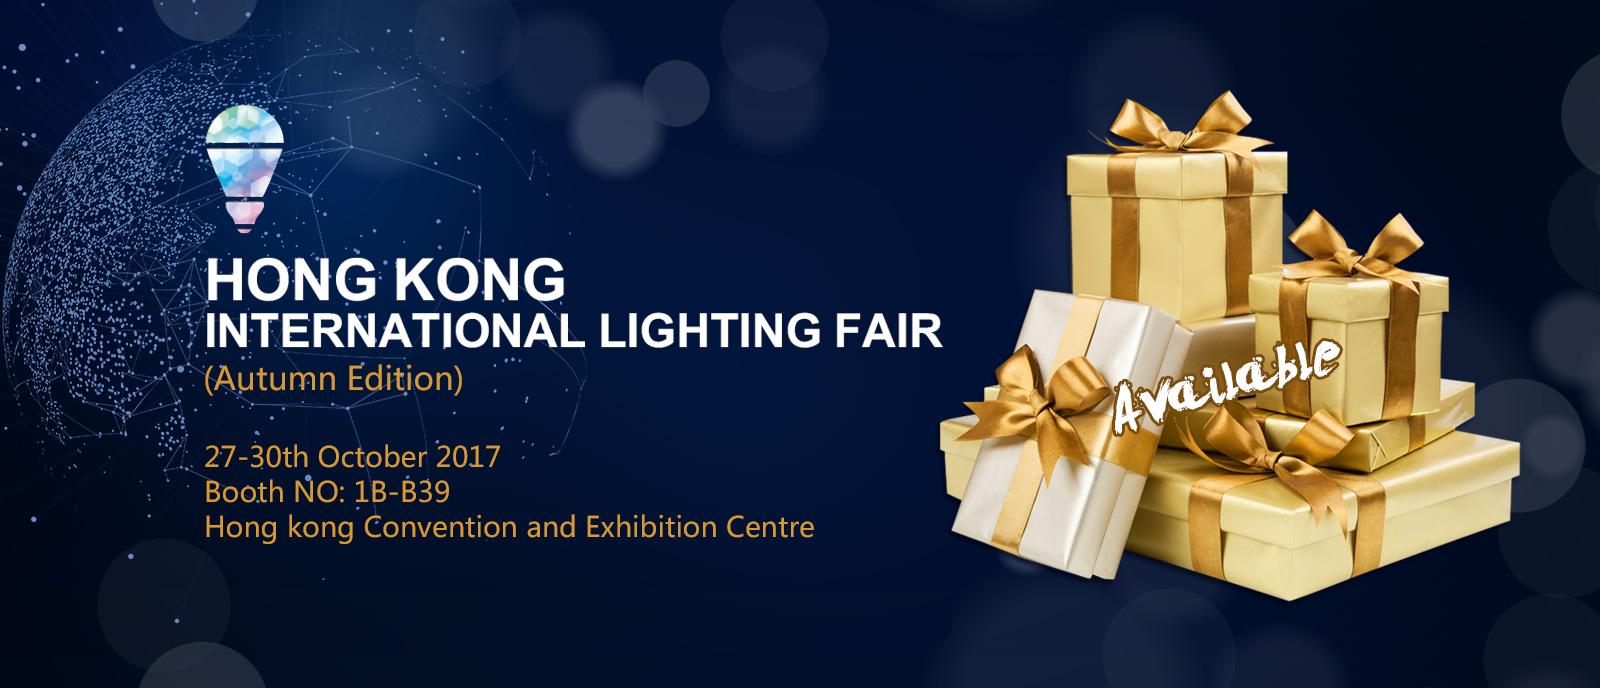 Hong Kong International Lighting Fair?27-30th October 2017 & Hong Kong International Lighting Fair?27-30th October 2017? azcodes.com